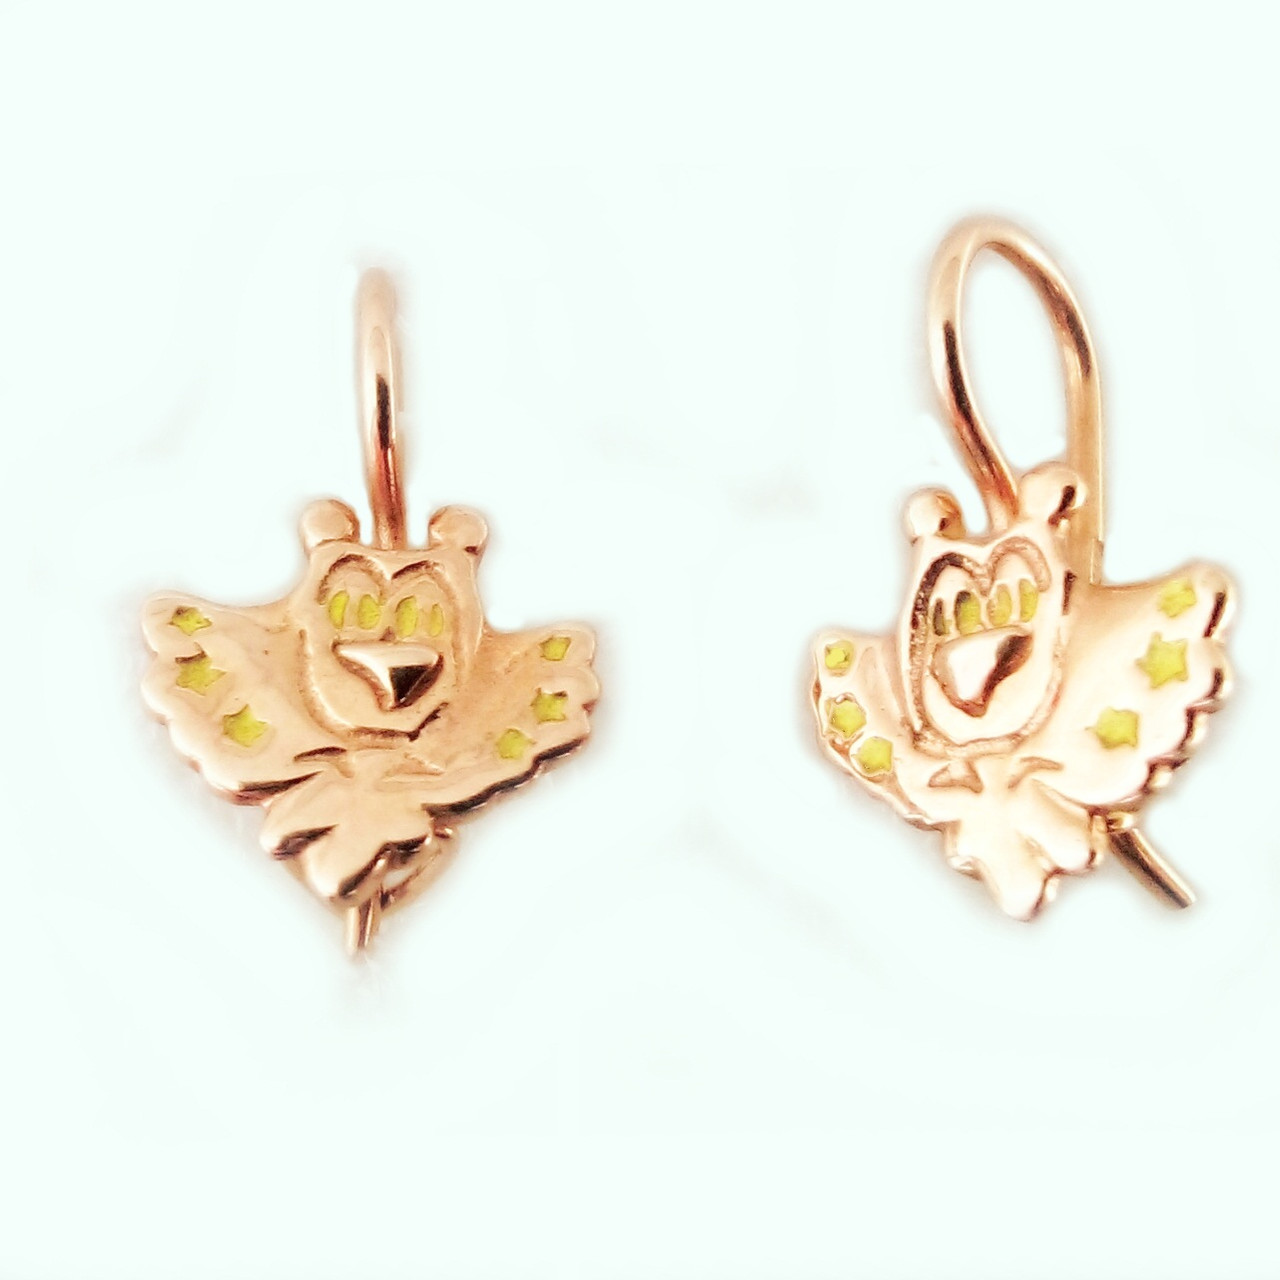 Сережки золотые сережки Сова, цена 1 999 грн., купить в Запорожье ... e494d725b66